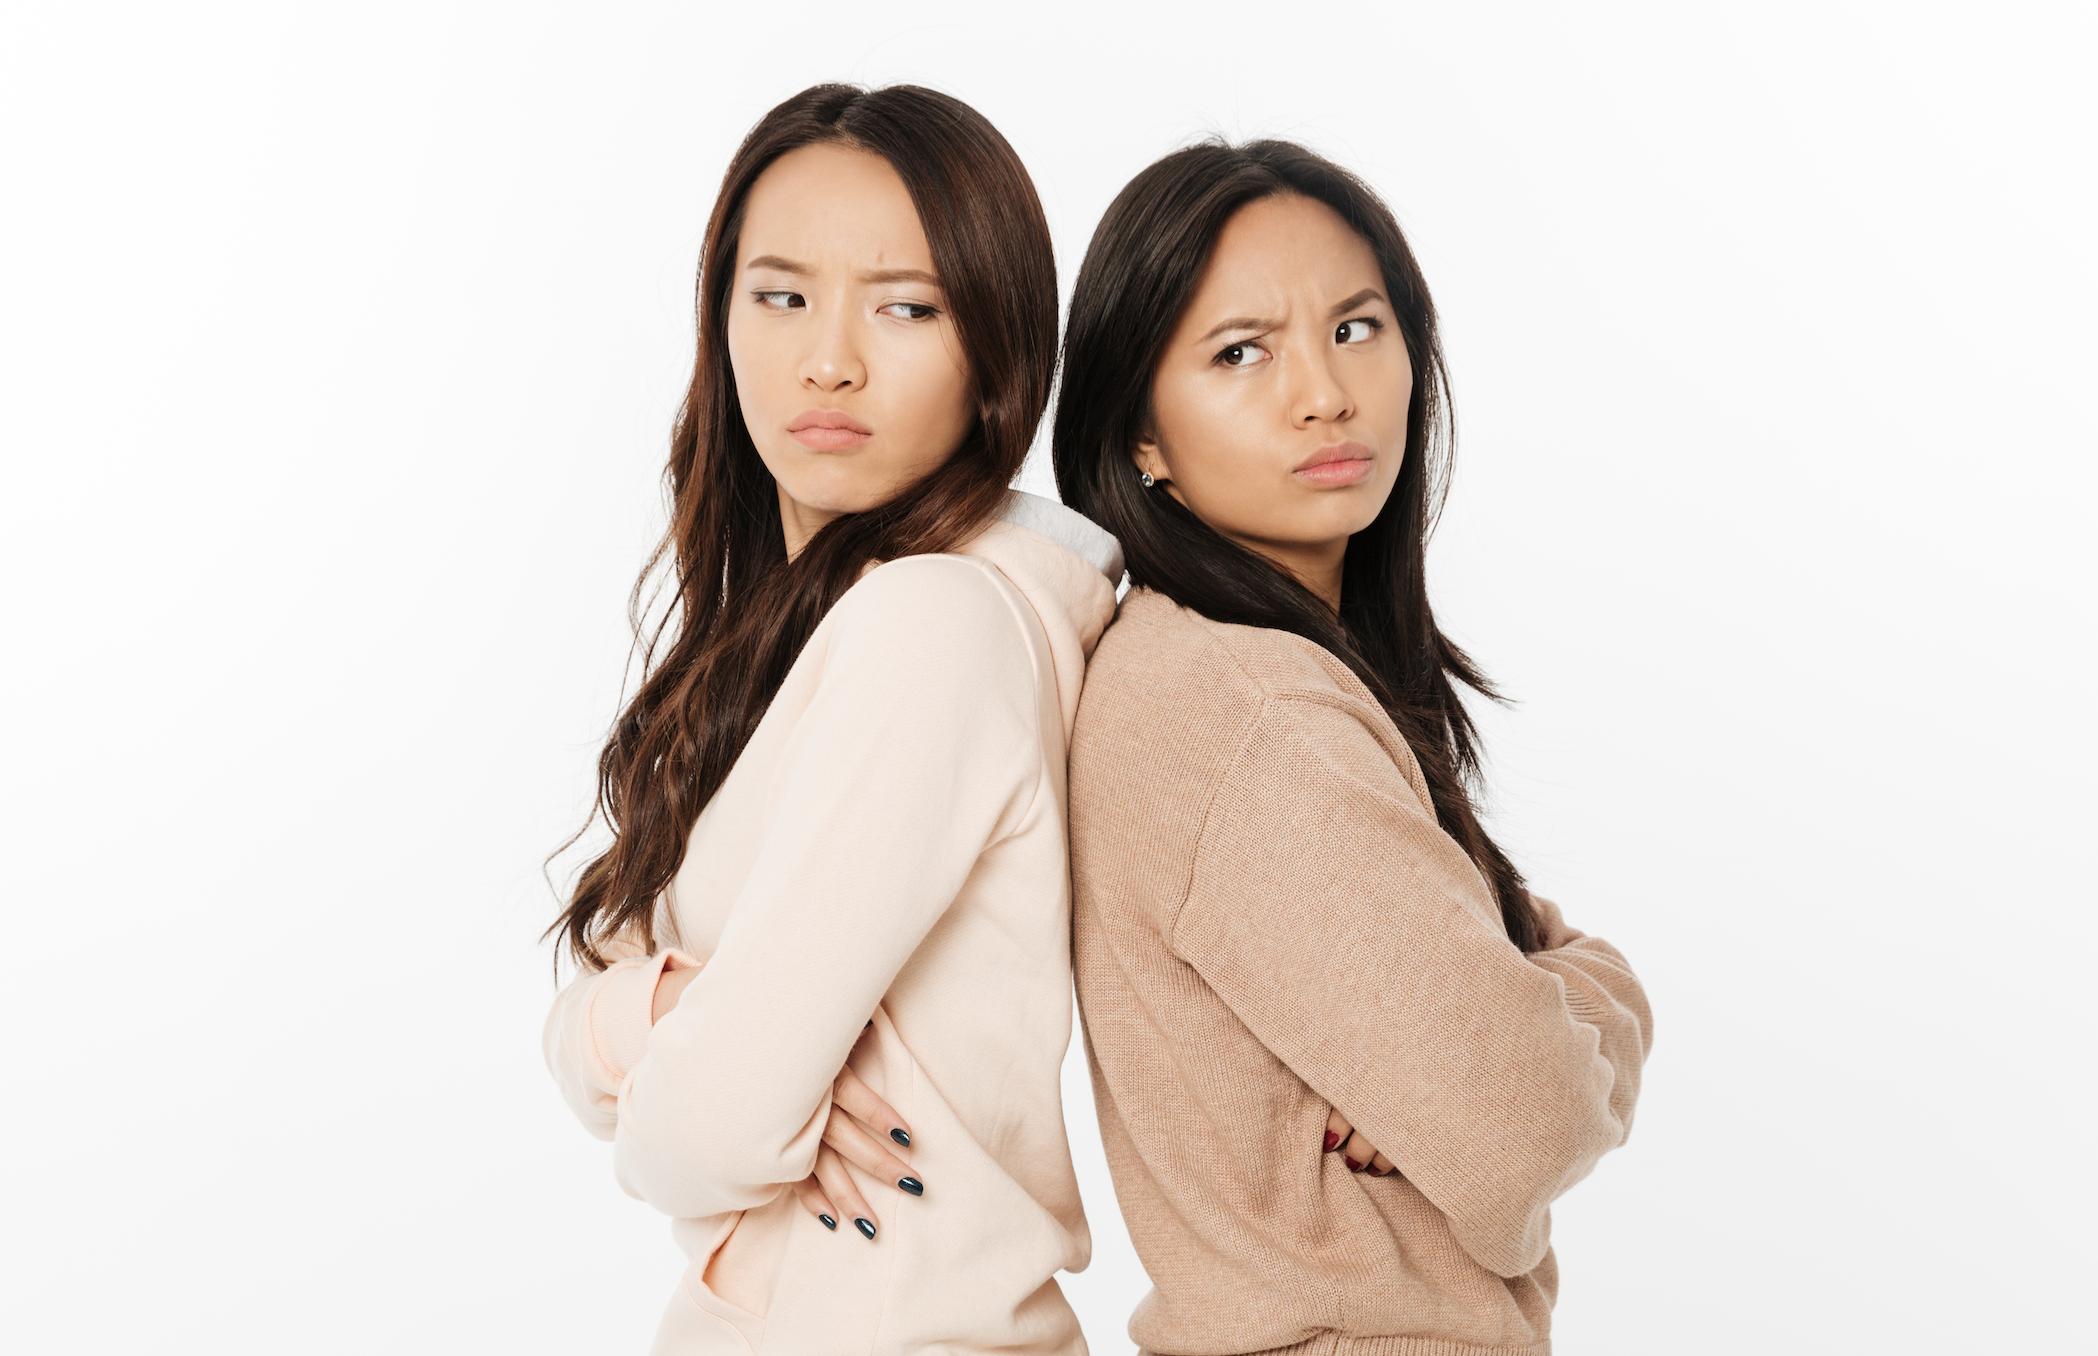 Will having IVF treatment alter my moods?